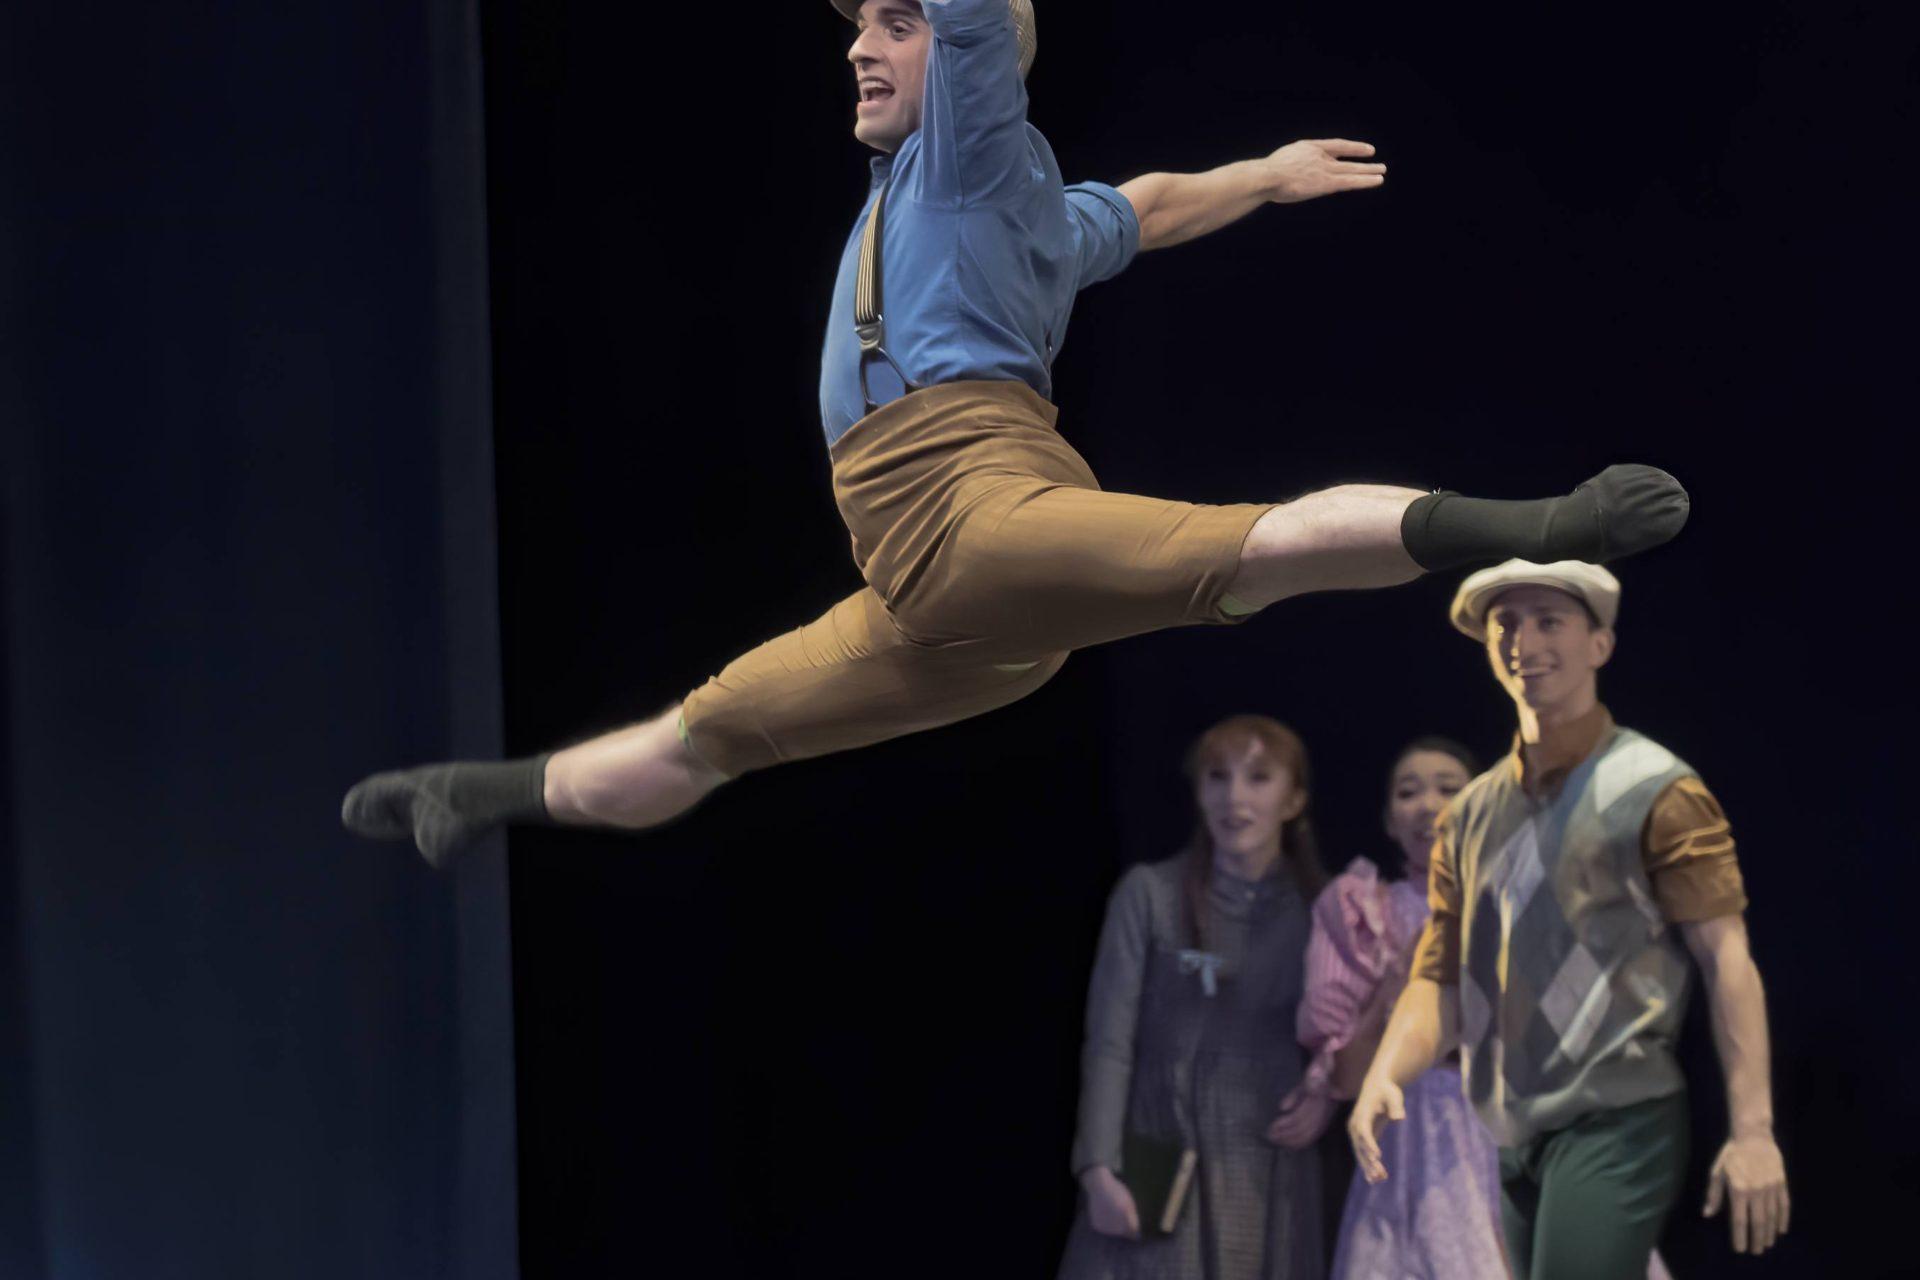 Anne of Green Gables The Ballet